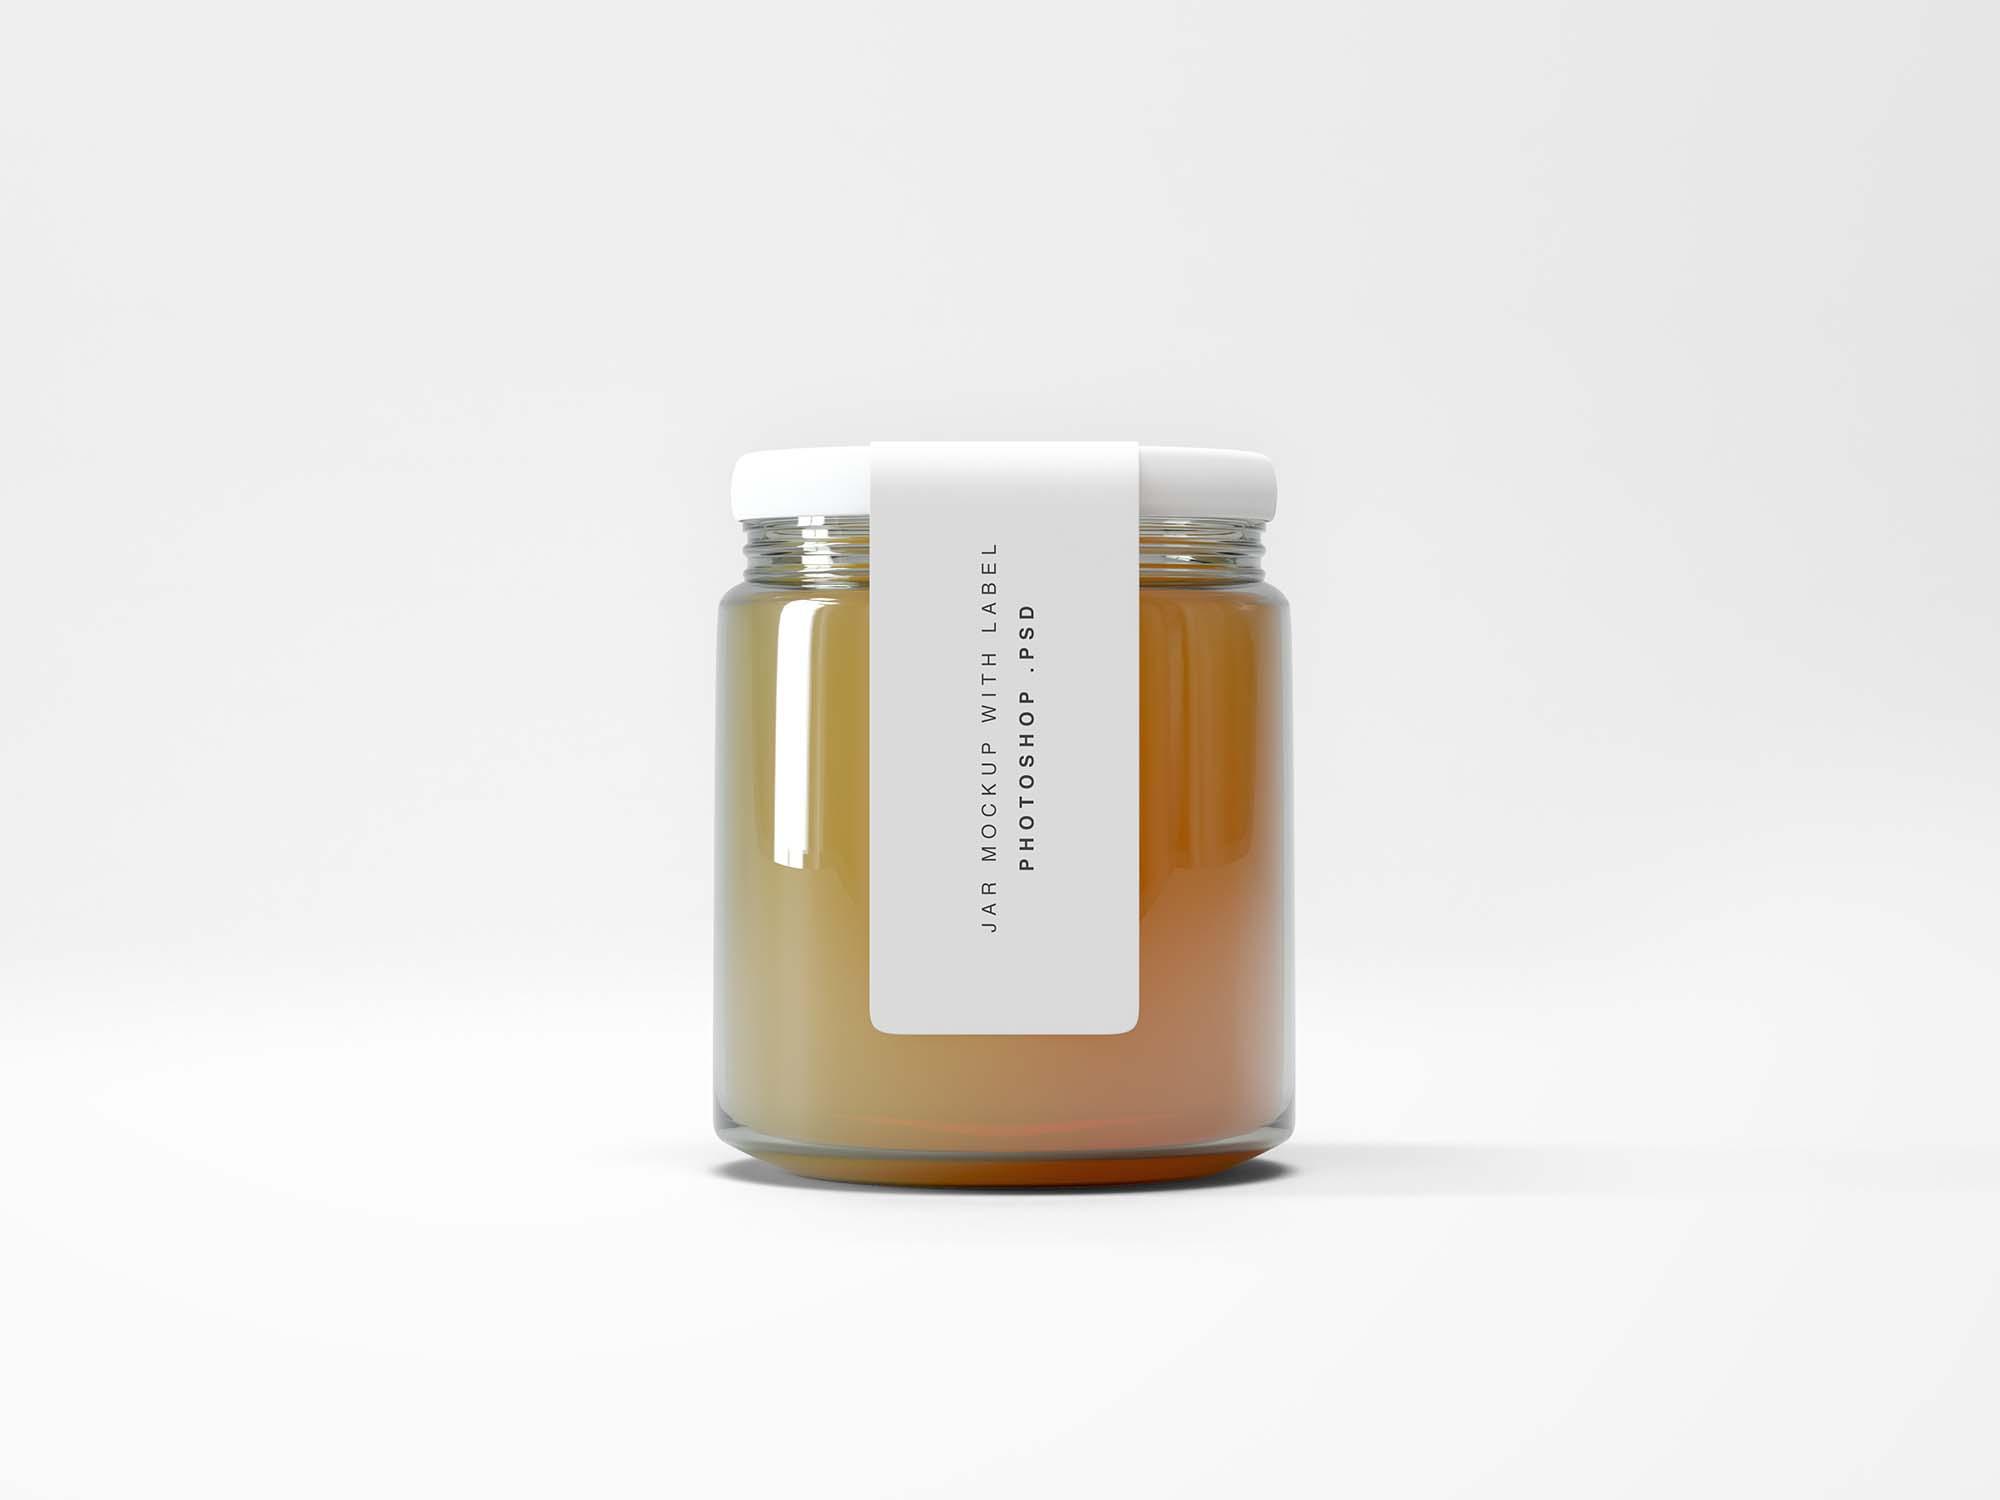 Compact Jar Mockup